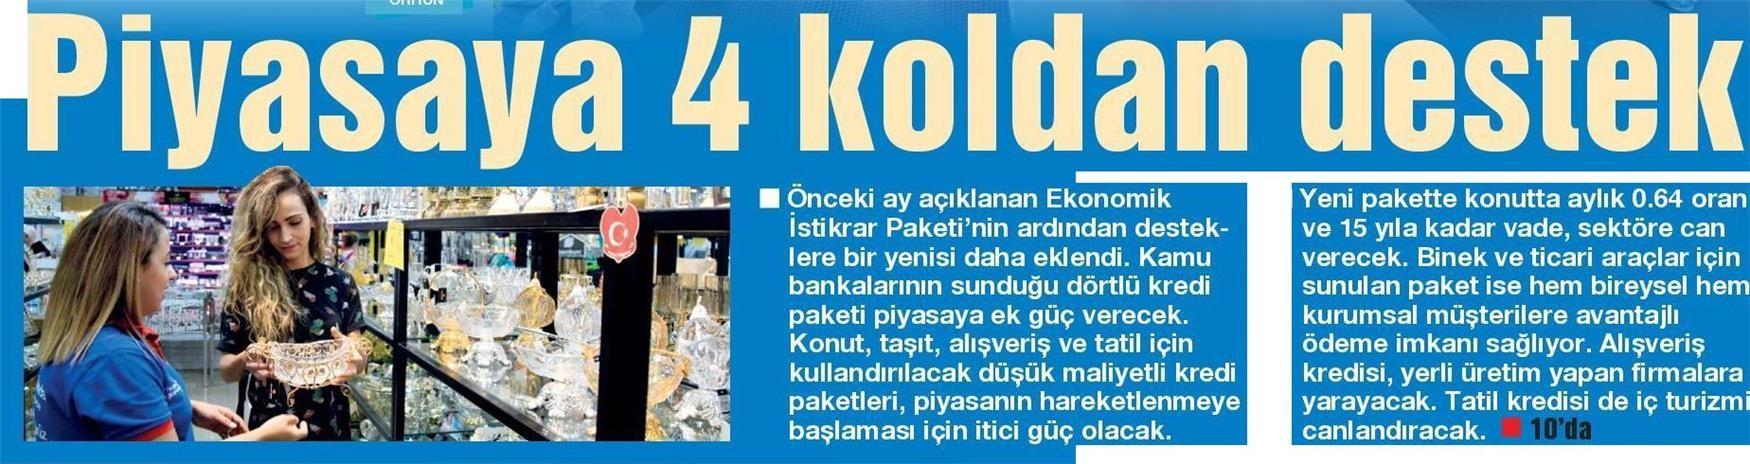 Zücder Ticaret Gazetesi 1. 05.06.2020